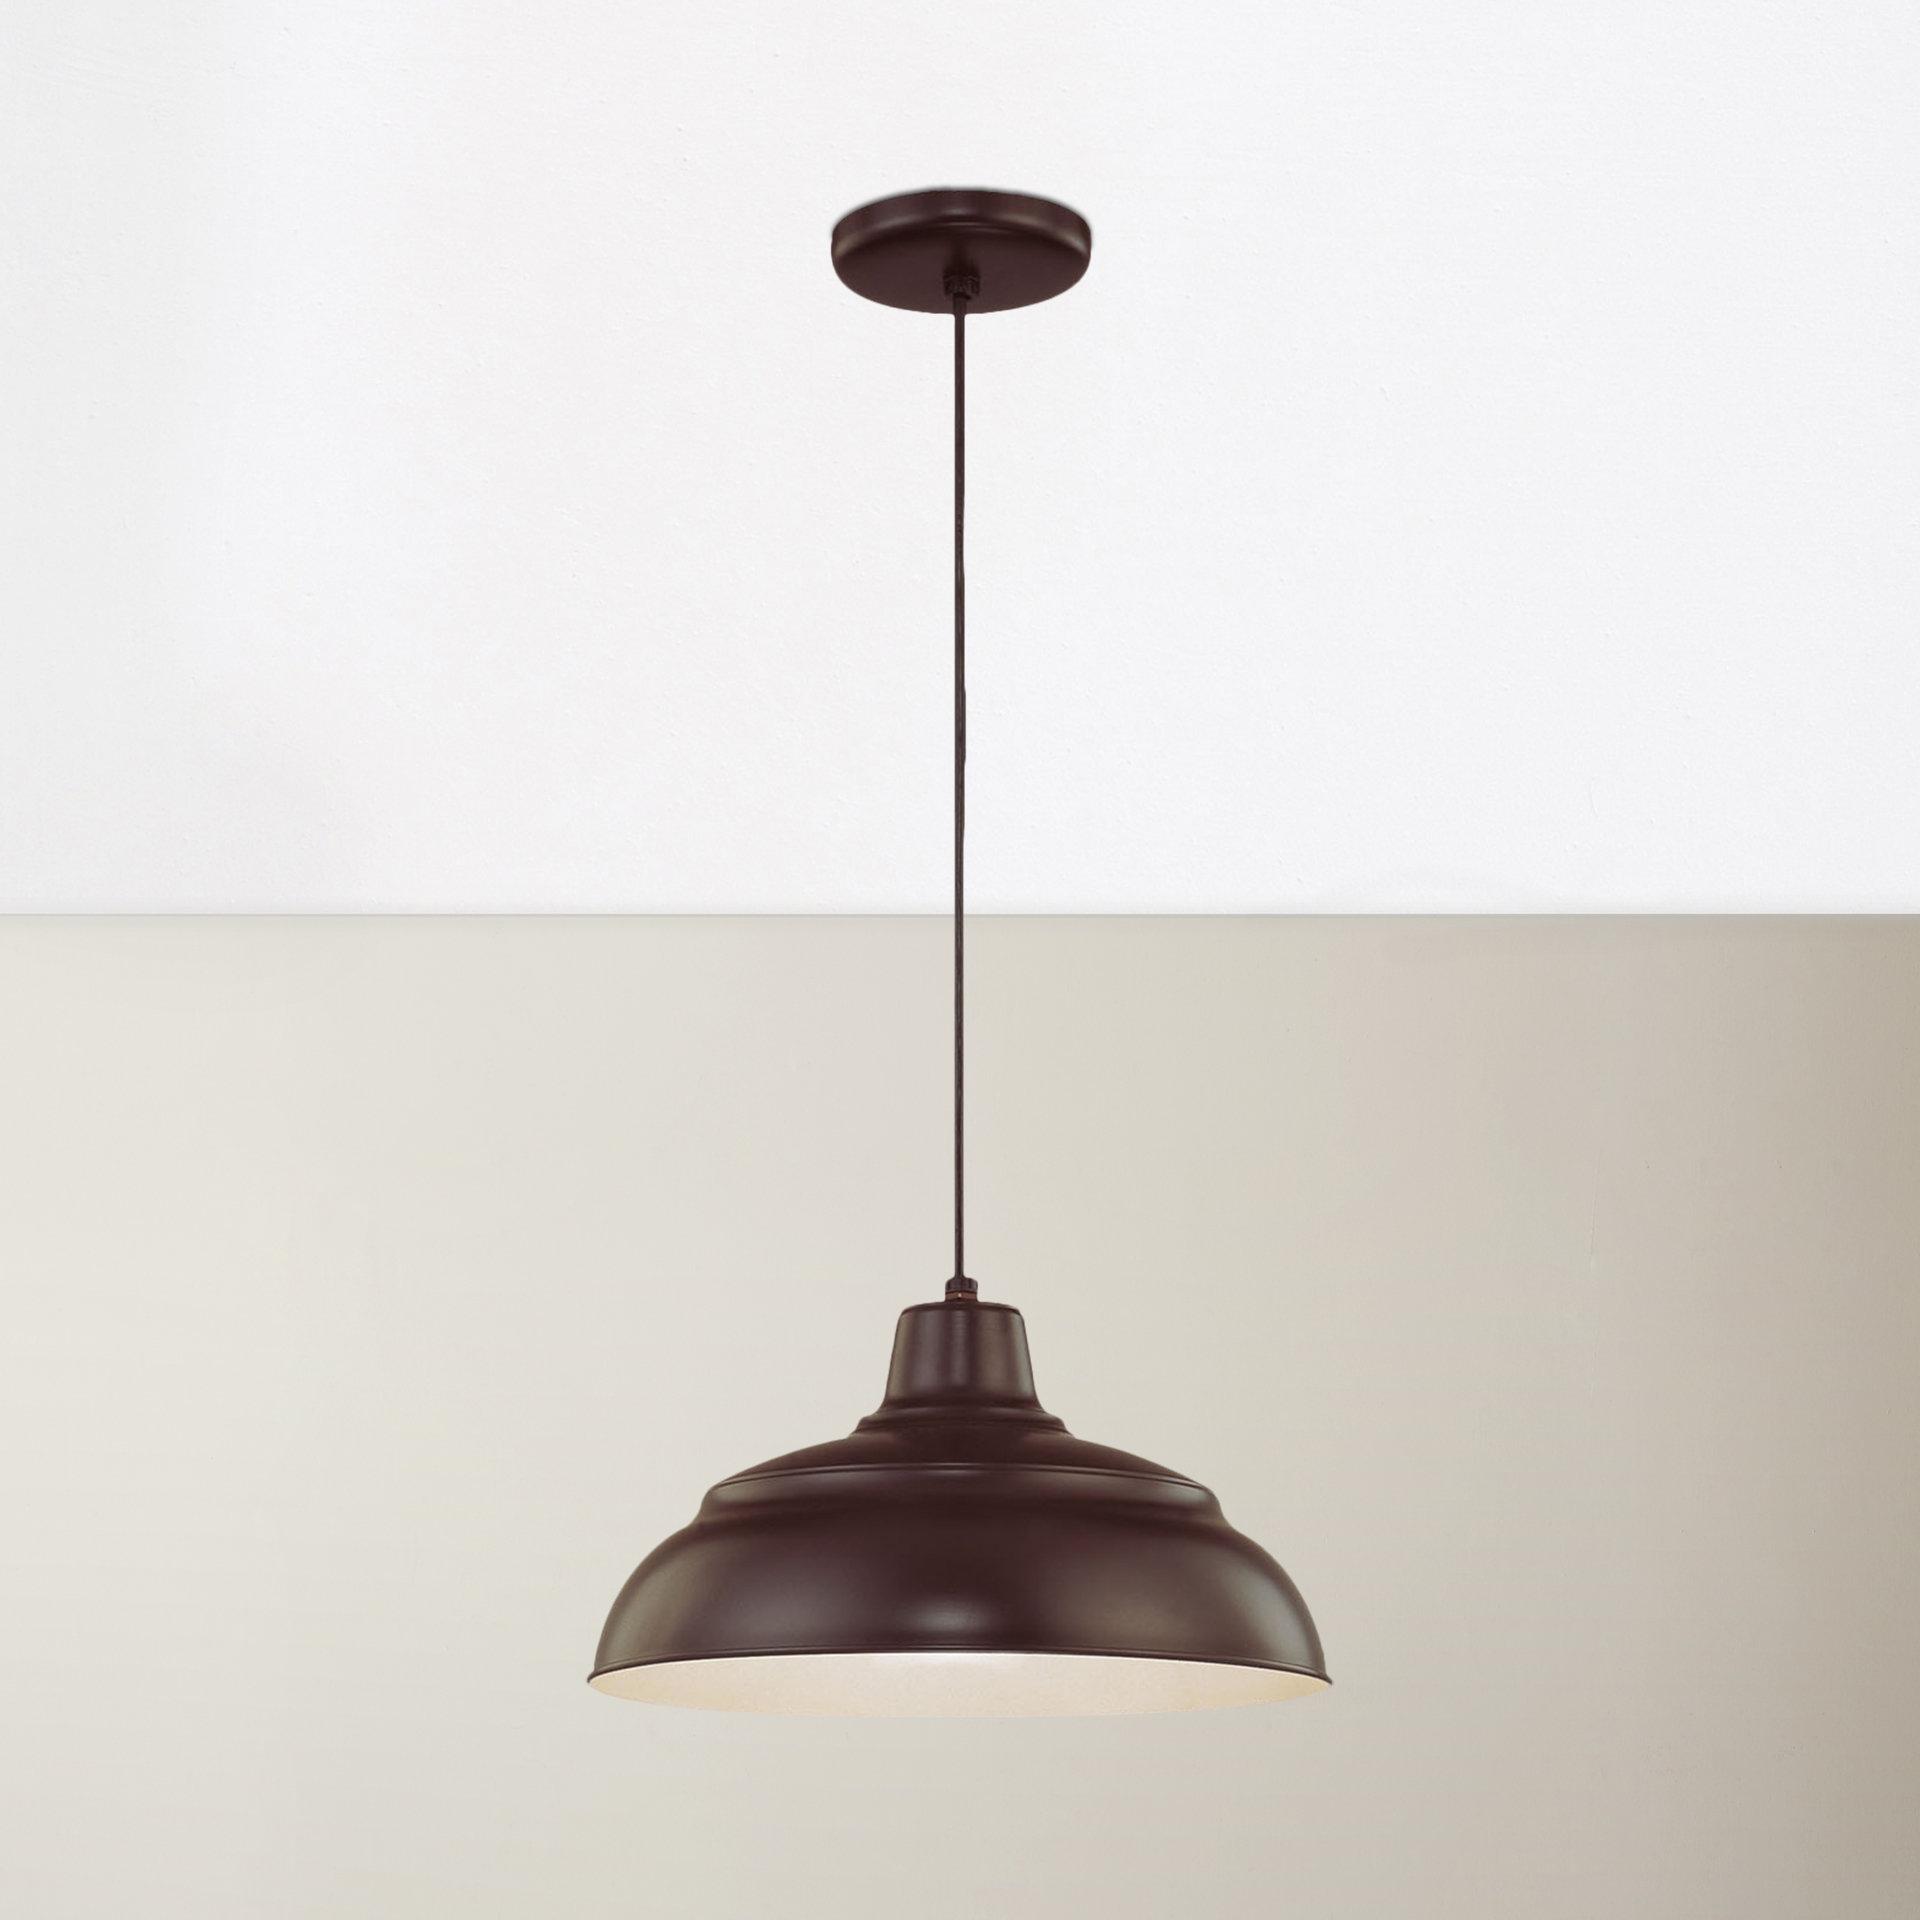 Stetson 1 Light Bowl Pendant With Favorite Adriana Black 1 Light Single Dome Pendants (View 5 of 25)